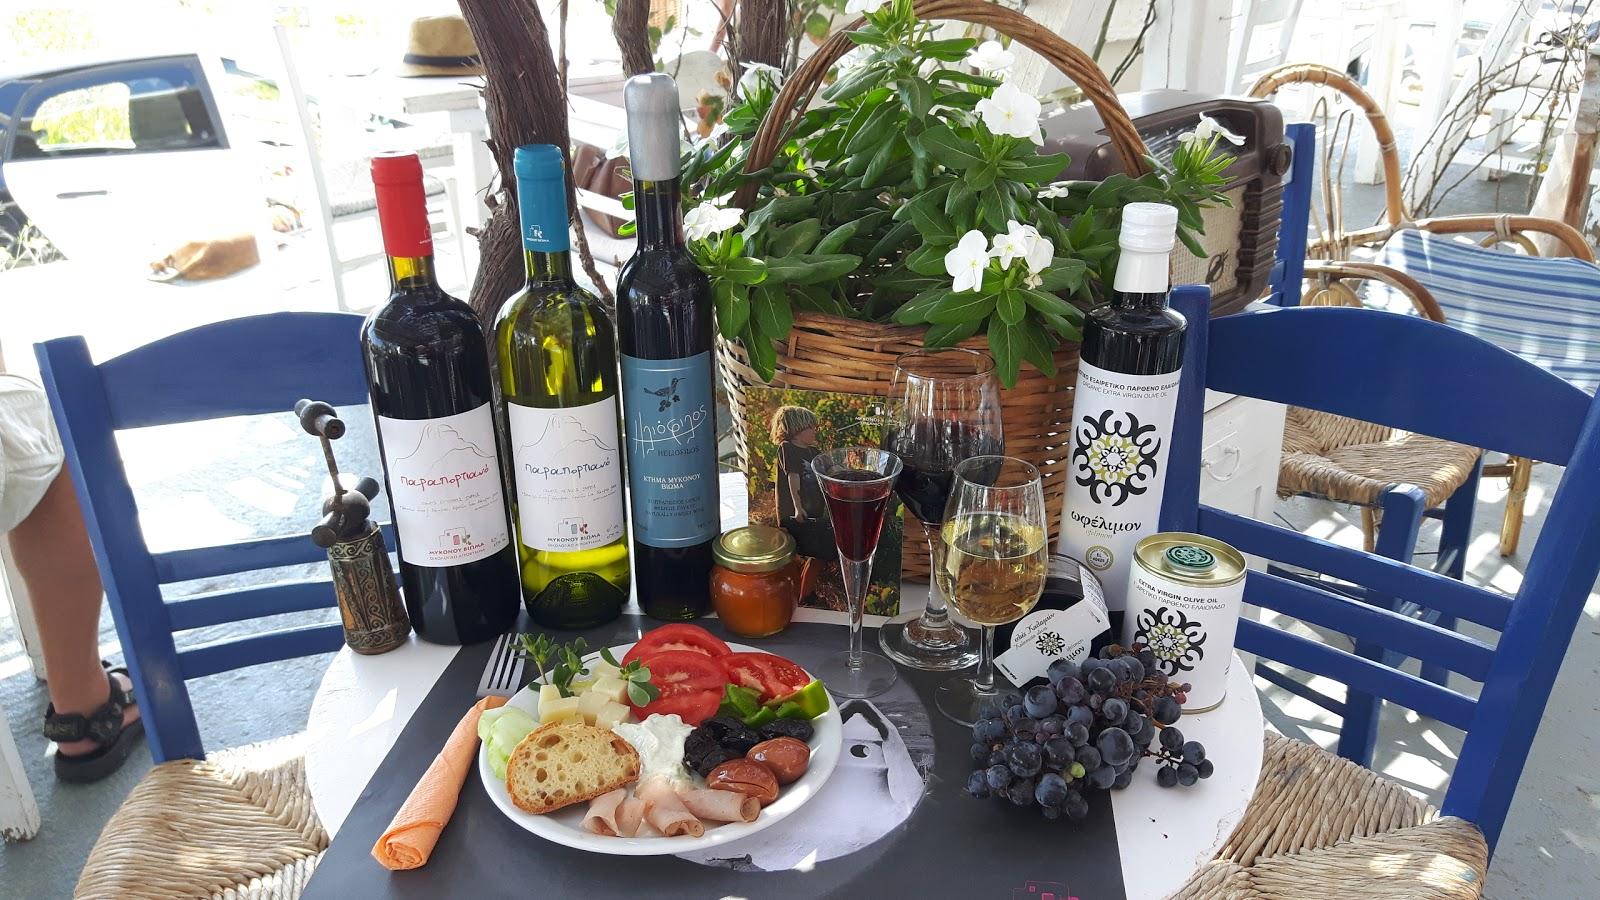 Visit Mykonos Vioma Organic Farm on your trip to Ano Mera or Greece